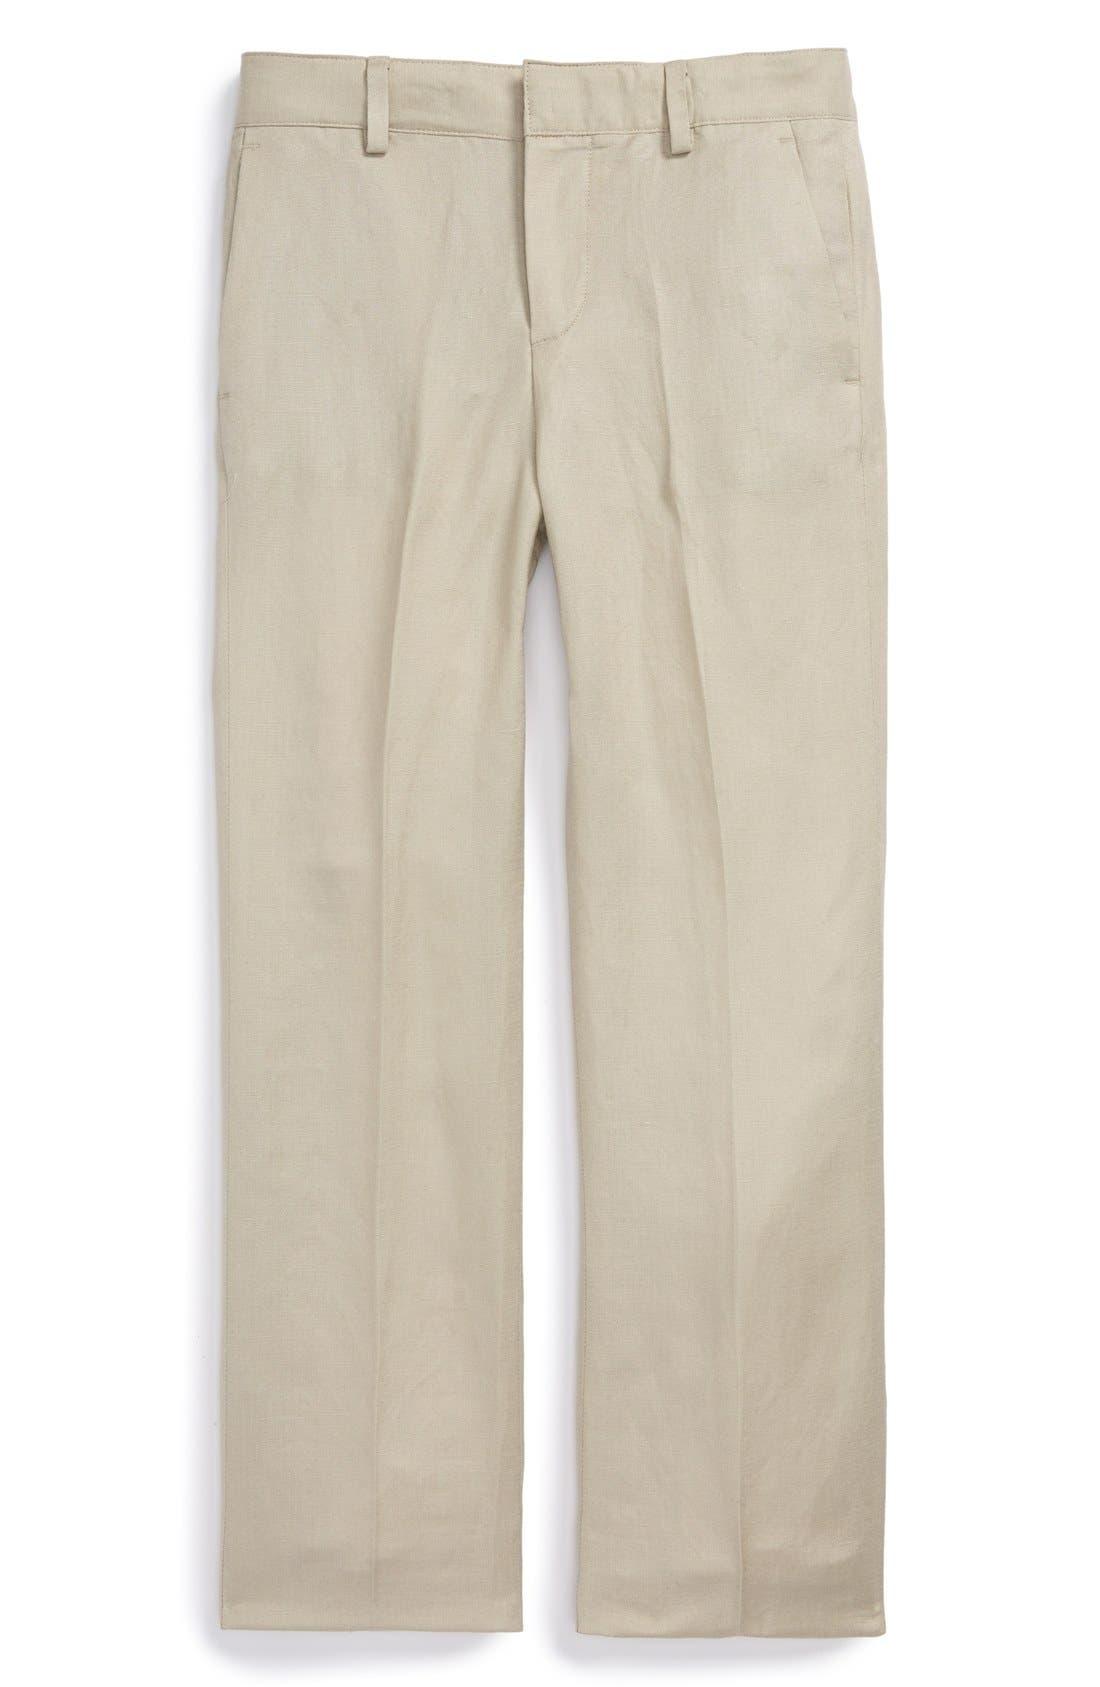 Main Image - Nordstrom 'Quentin' Linen Blend Trousers (Toddler Boys, Little Boys & Big Boys)